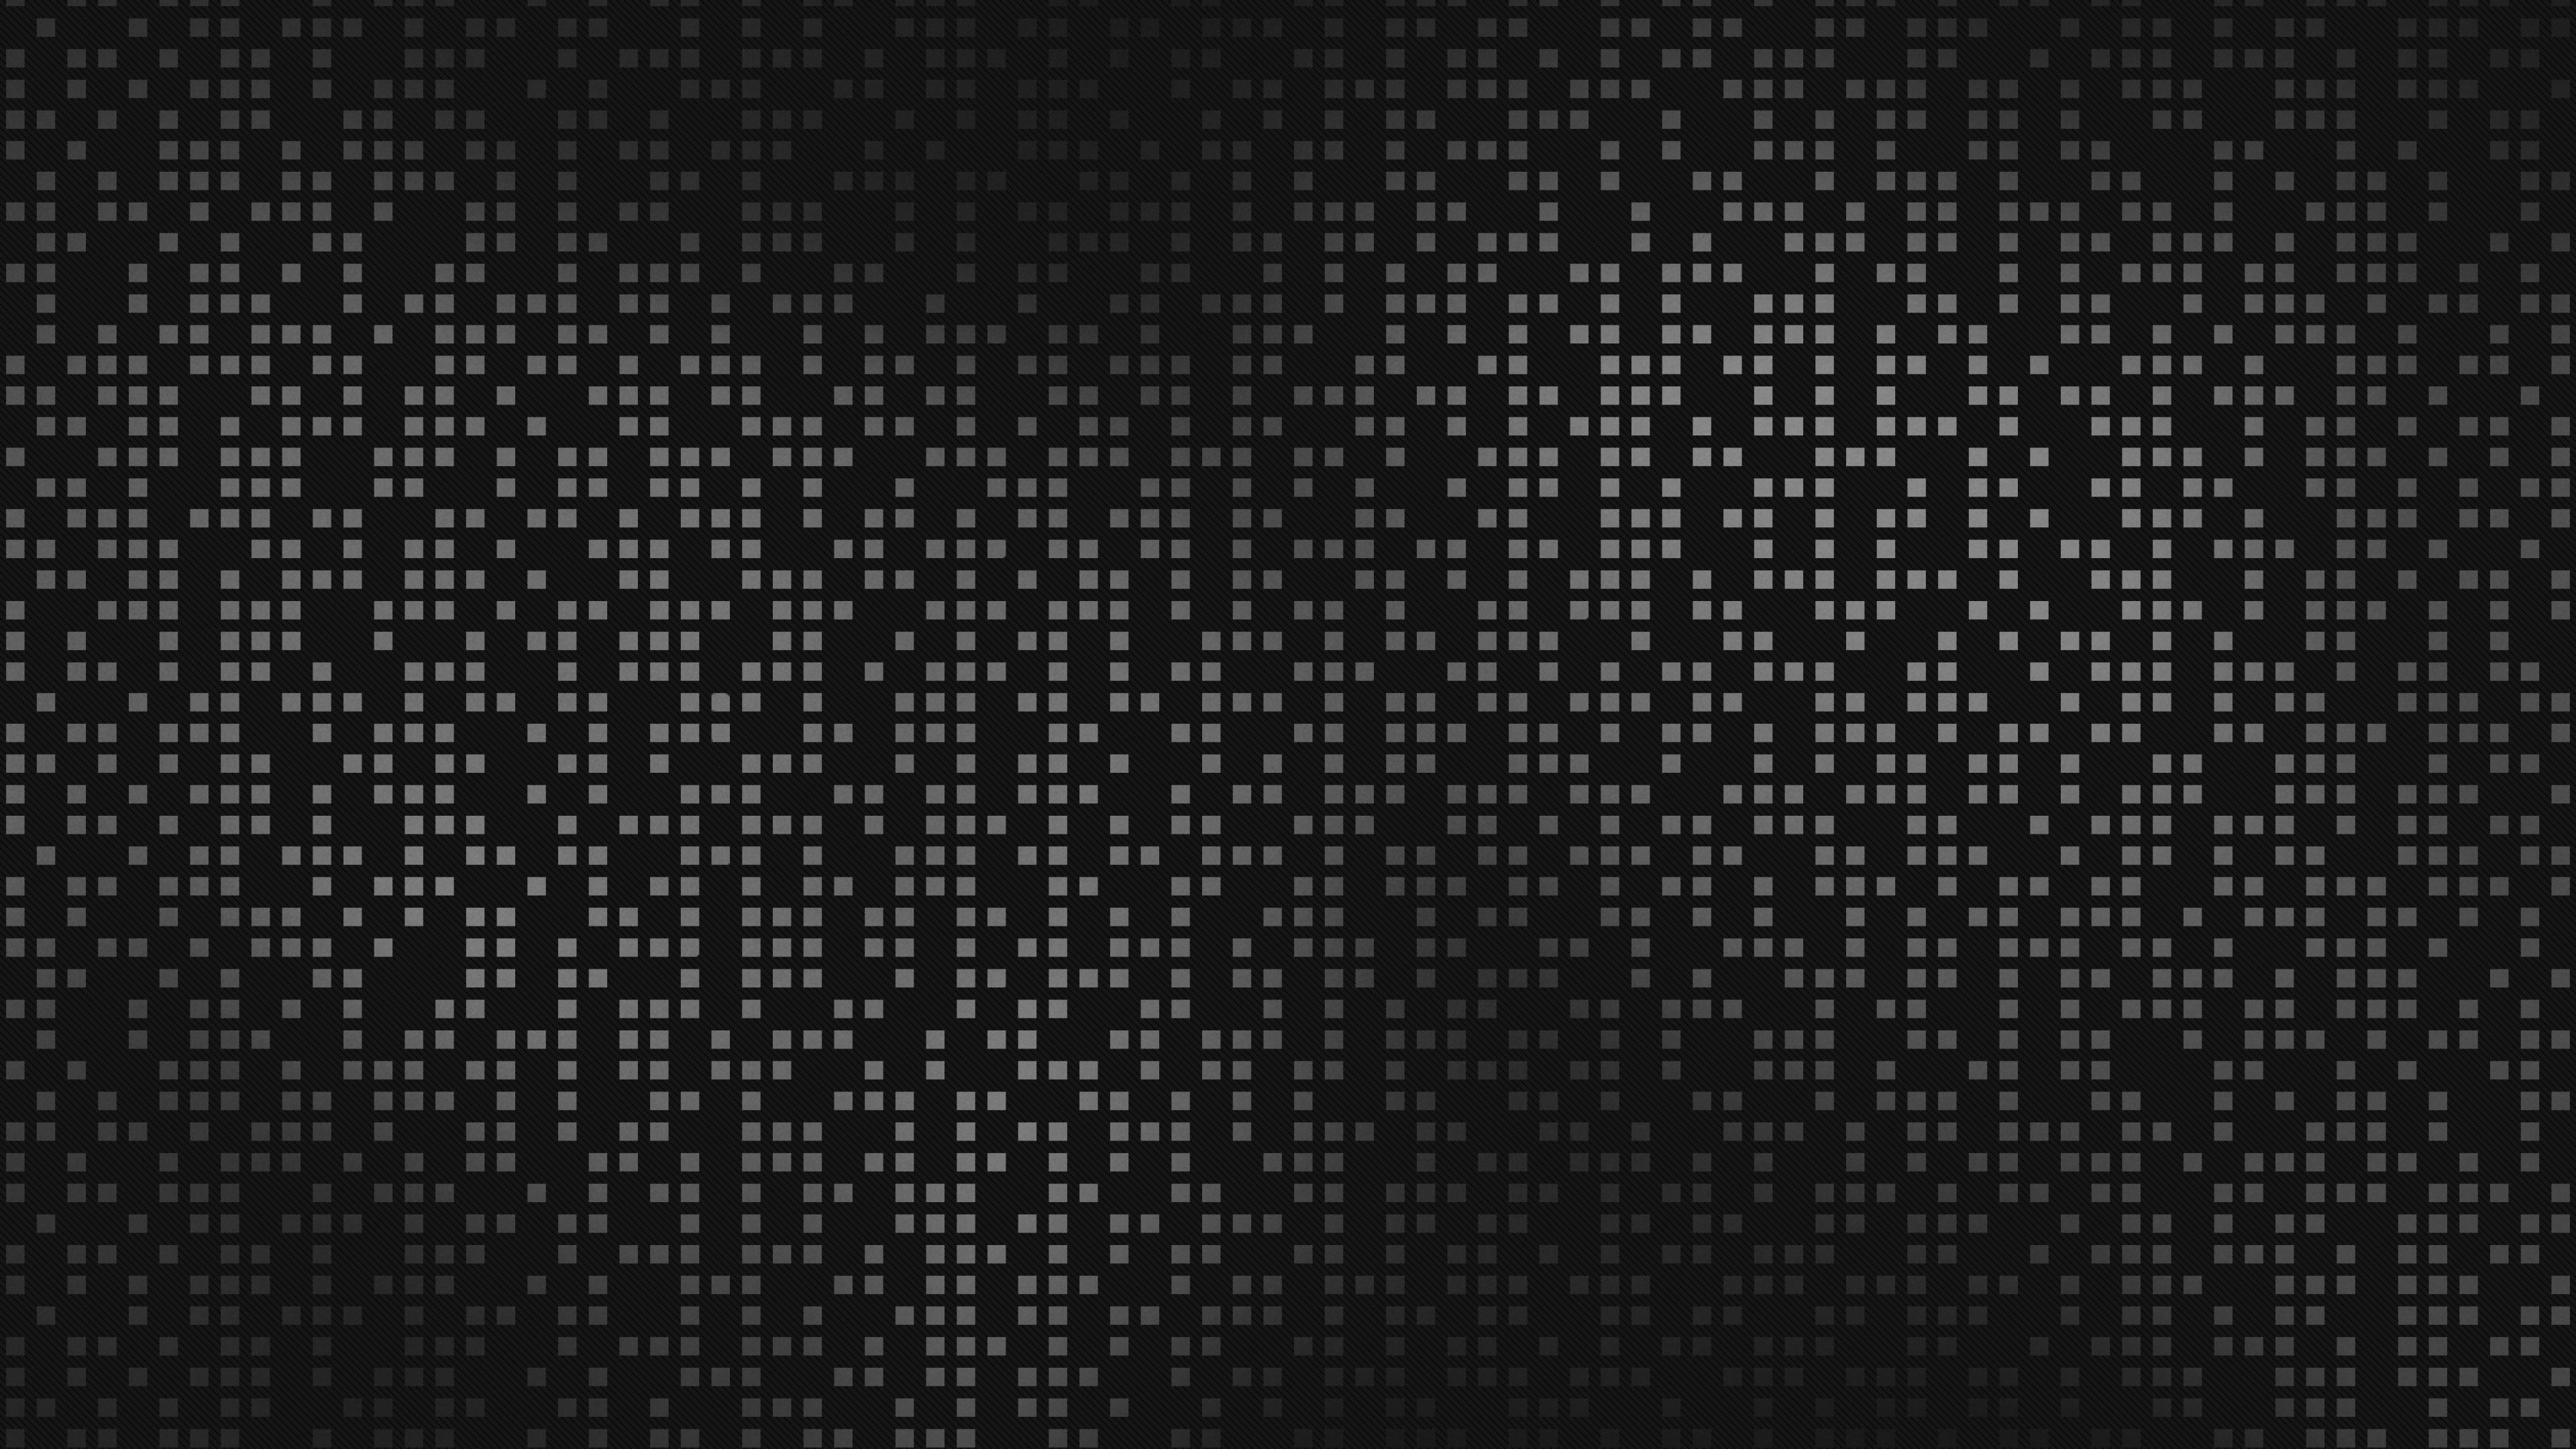 4K Ultra HD 3840x2160 Wallpaper gray black texture surface point 3840x2160